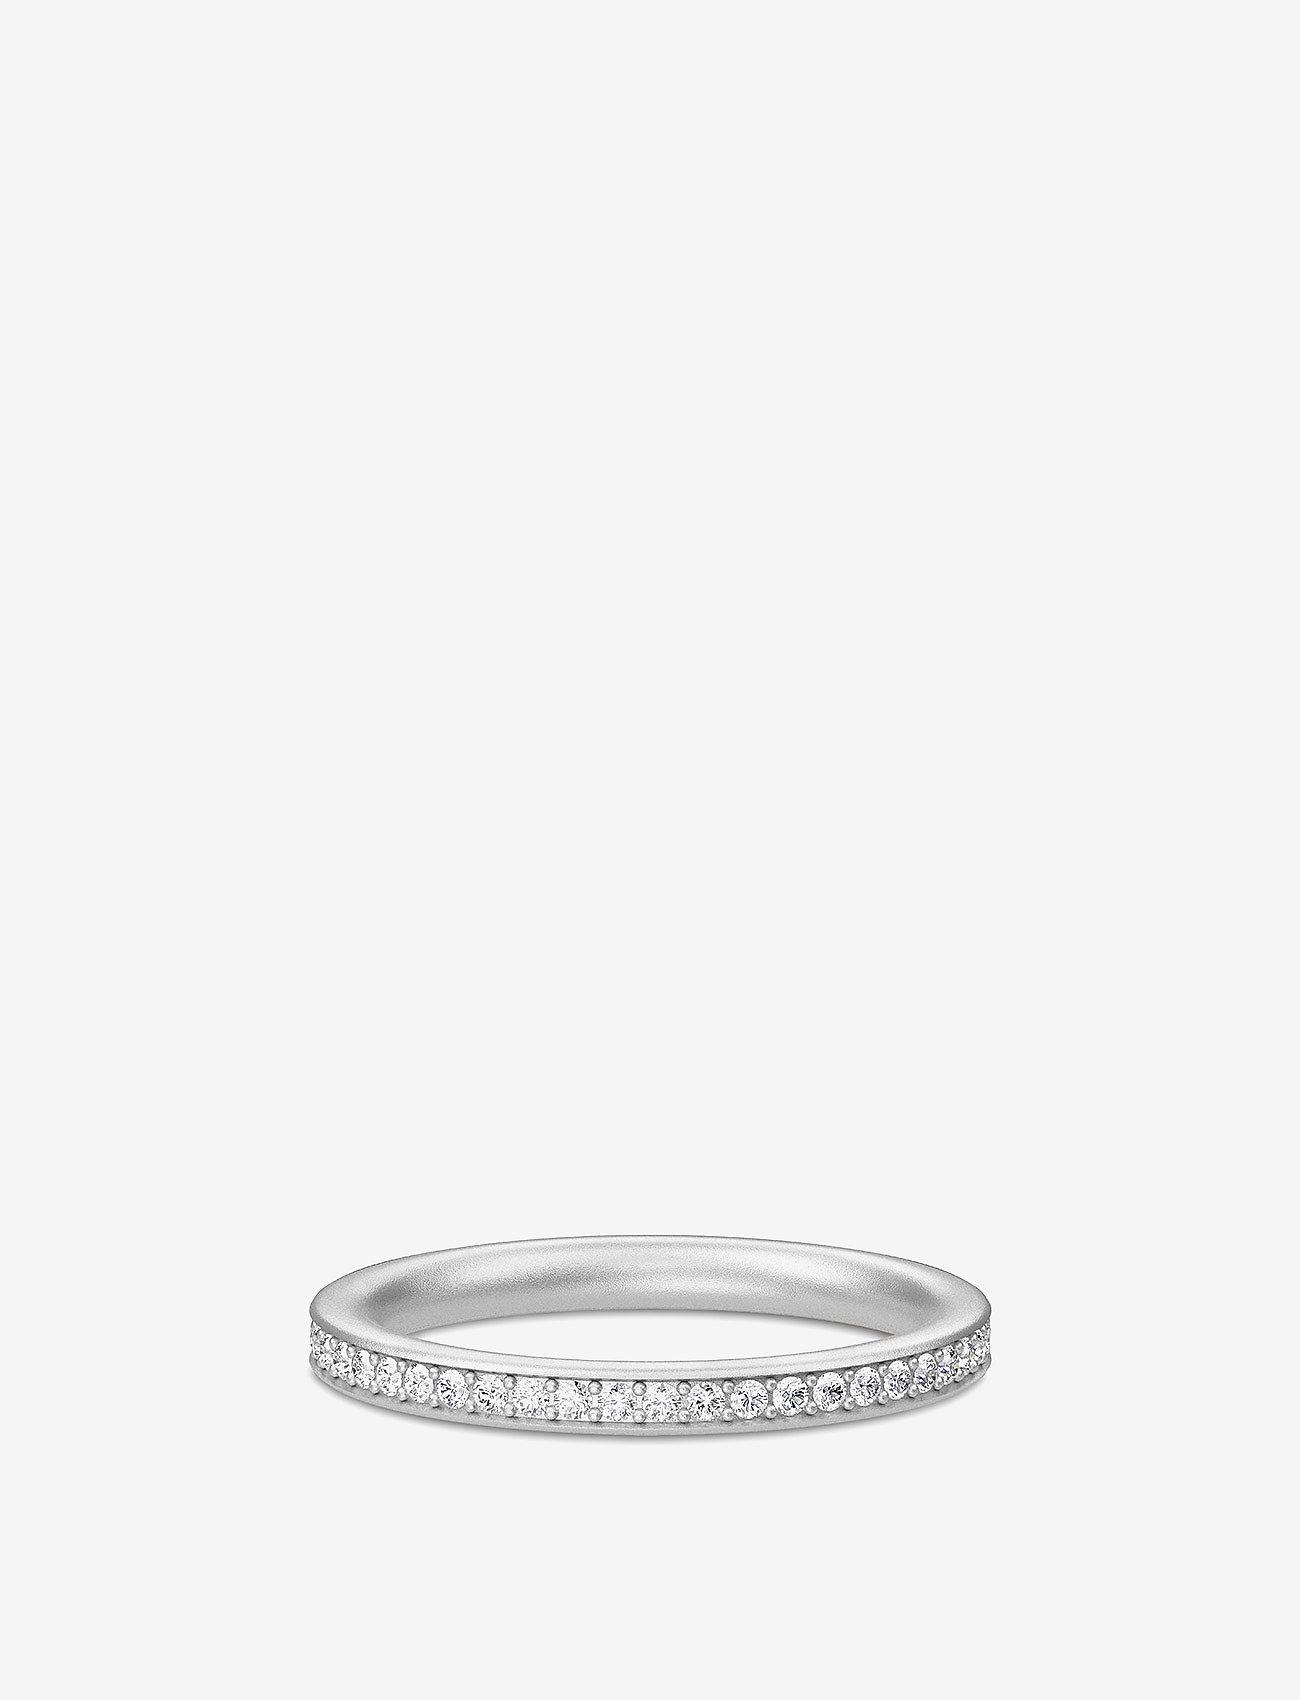 Julie Sandlau - Infinity ring - Rhodium - gredzeni - silver - 0